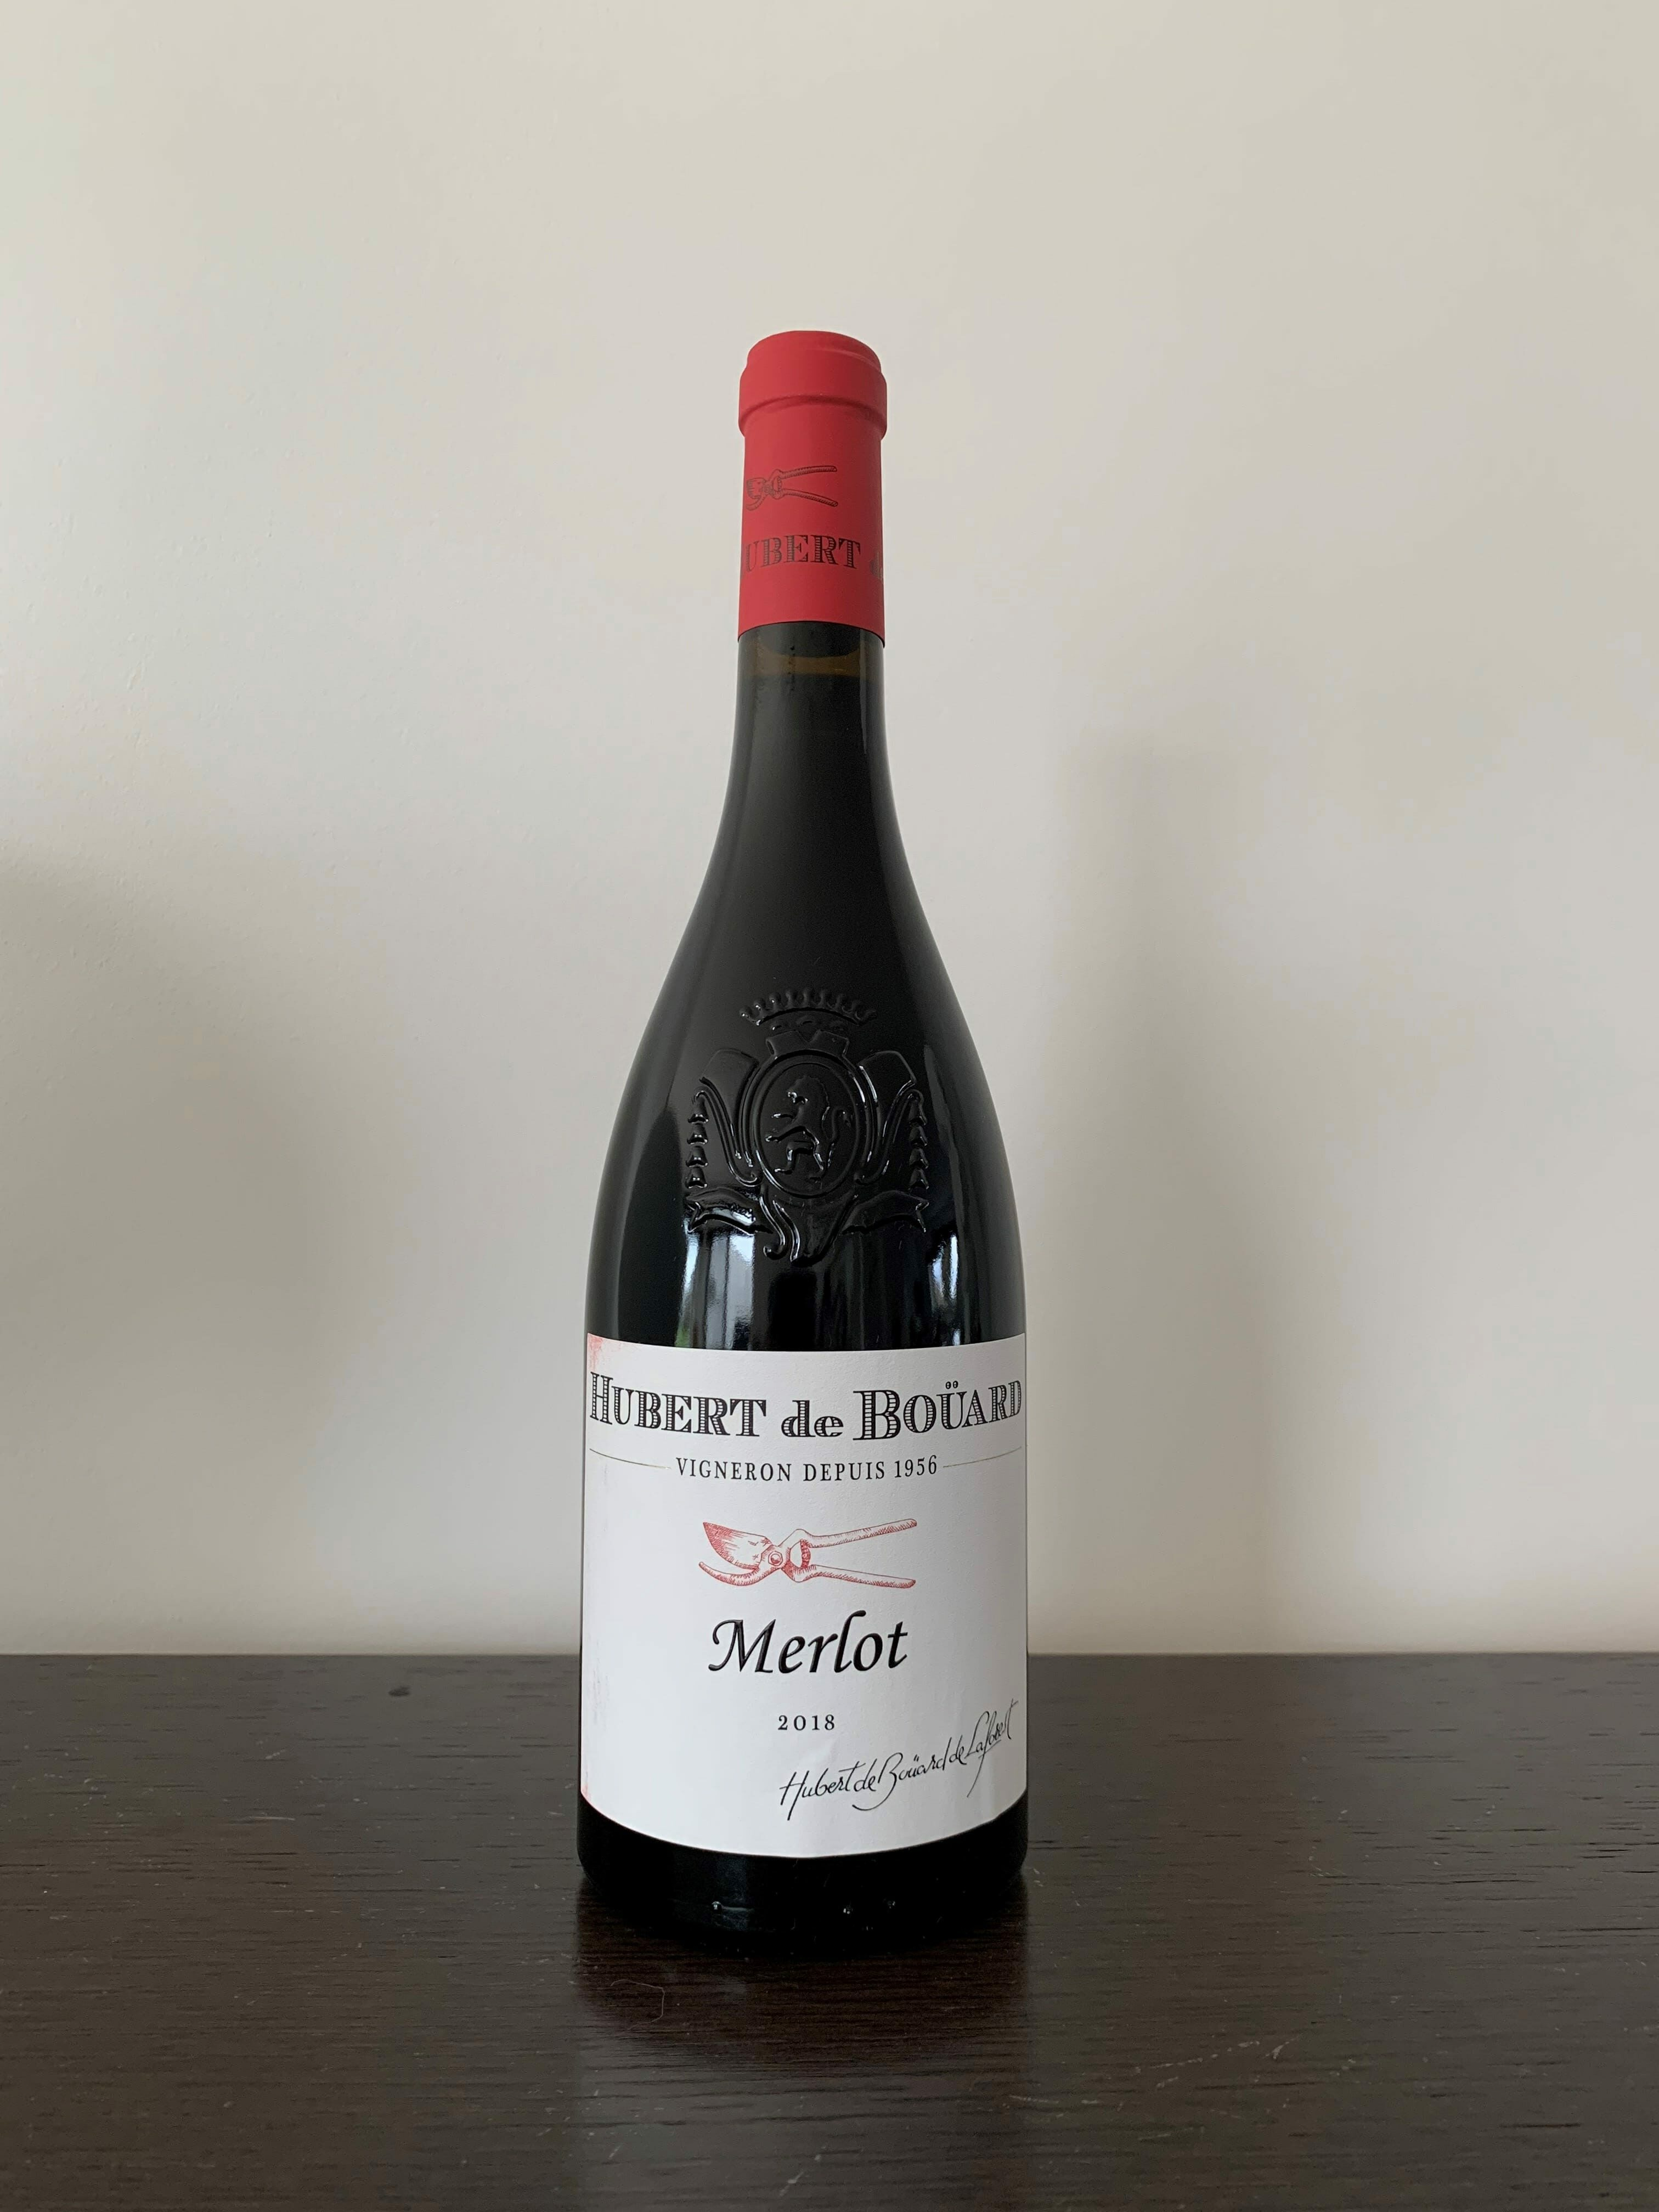 Hubert de Bouard Merlot